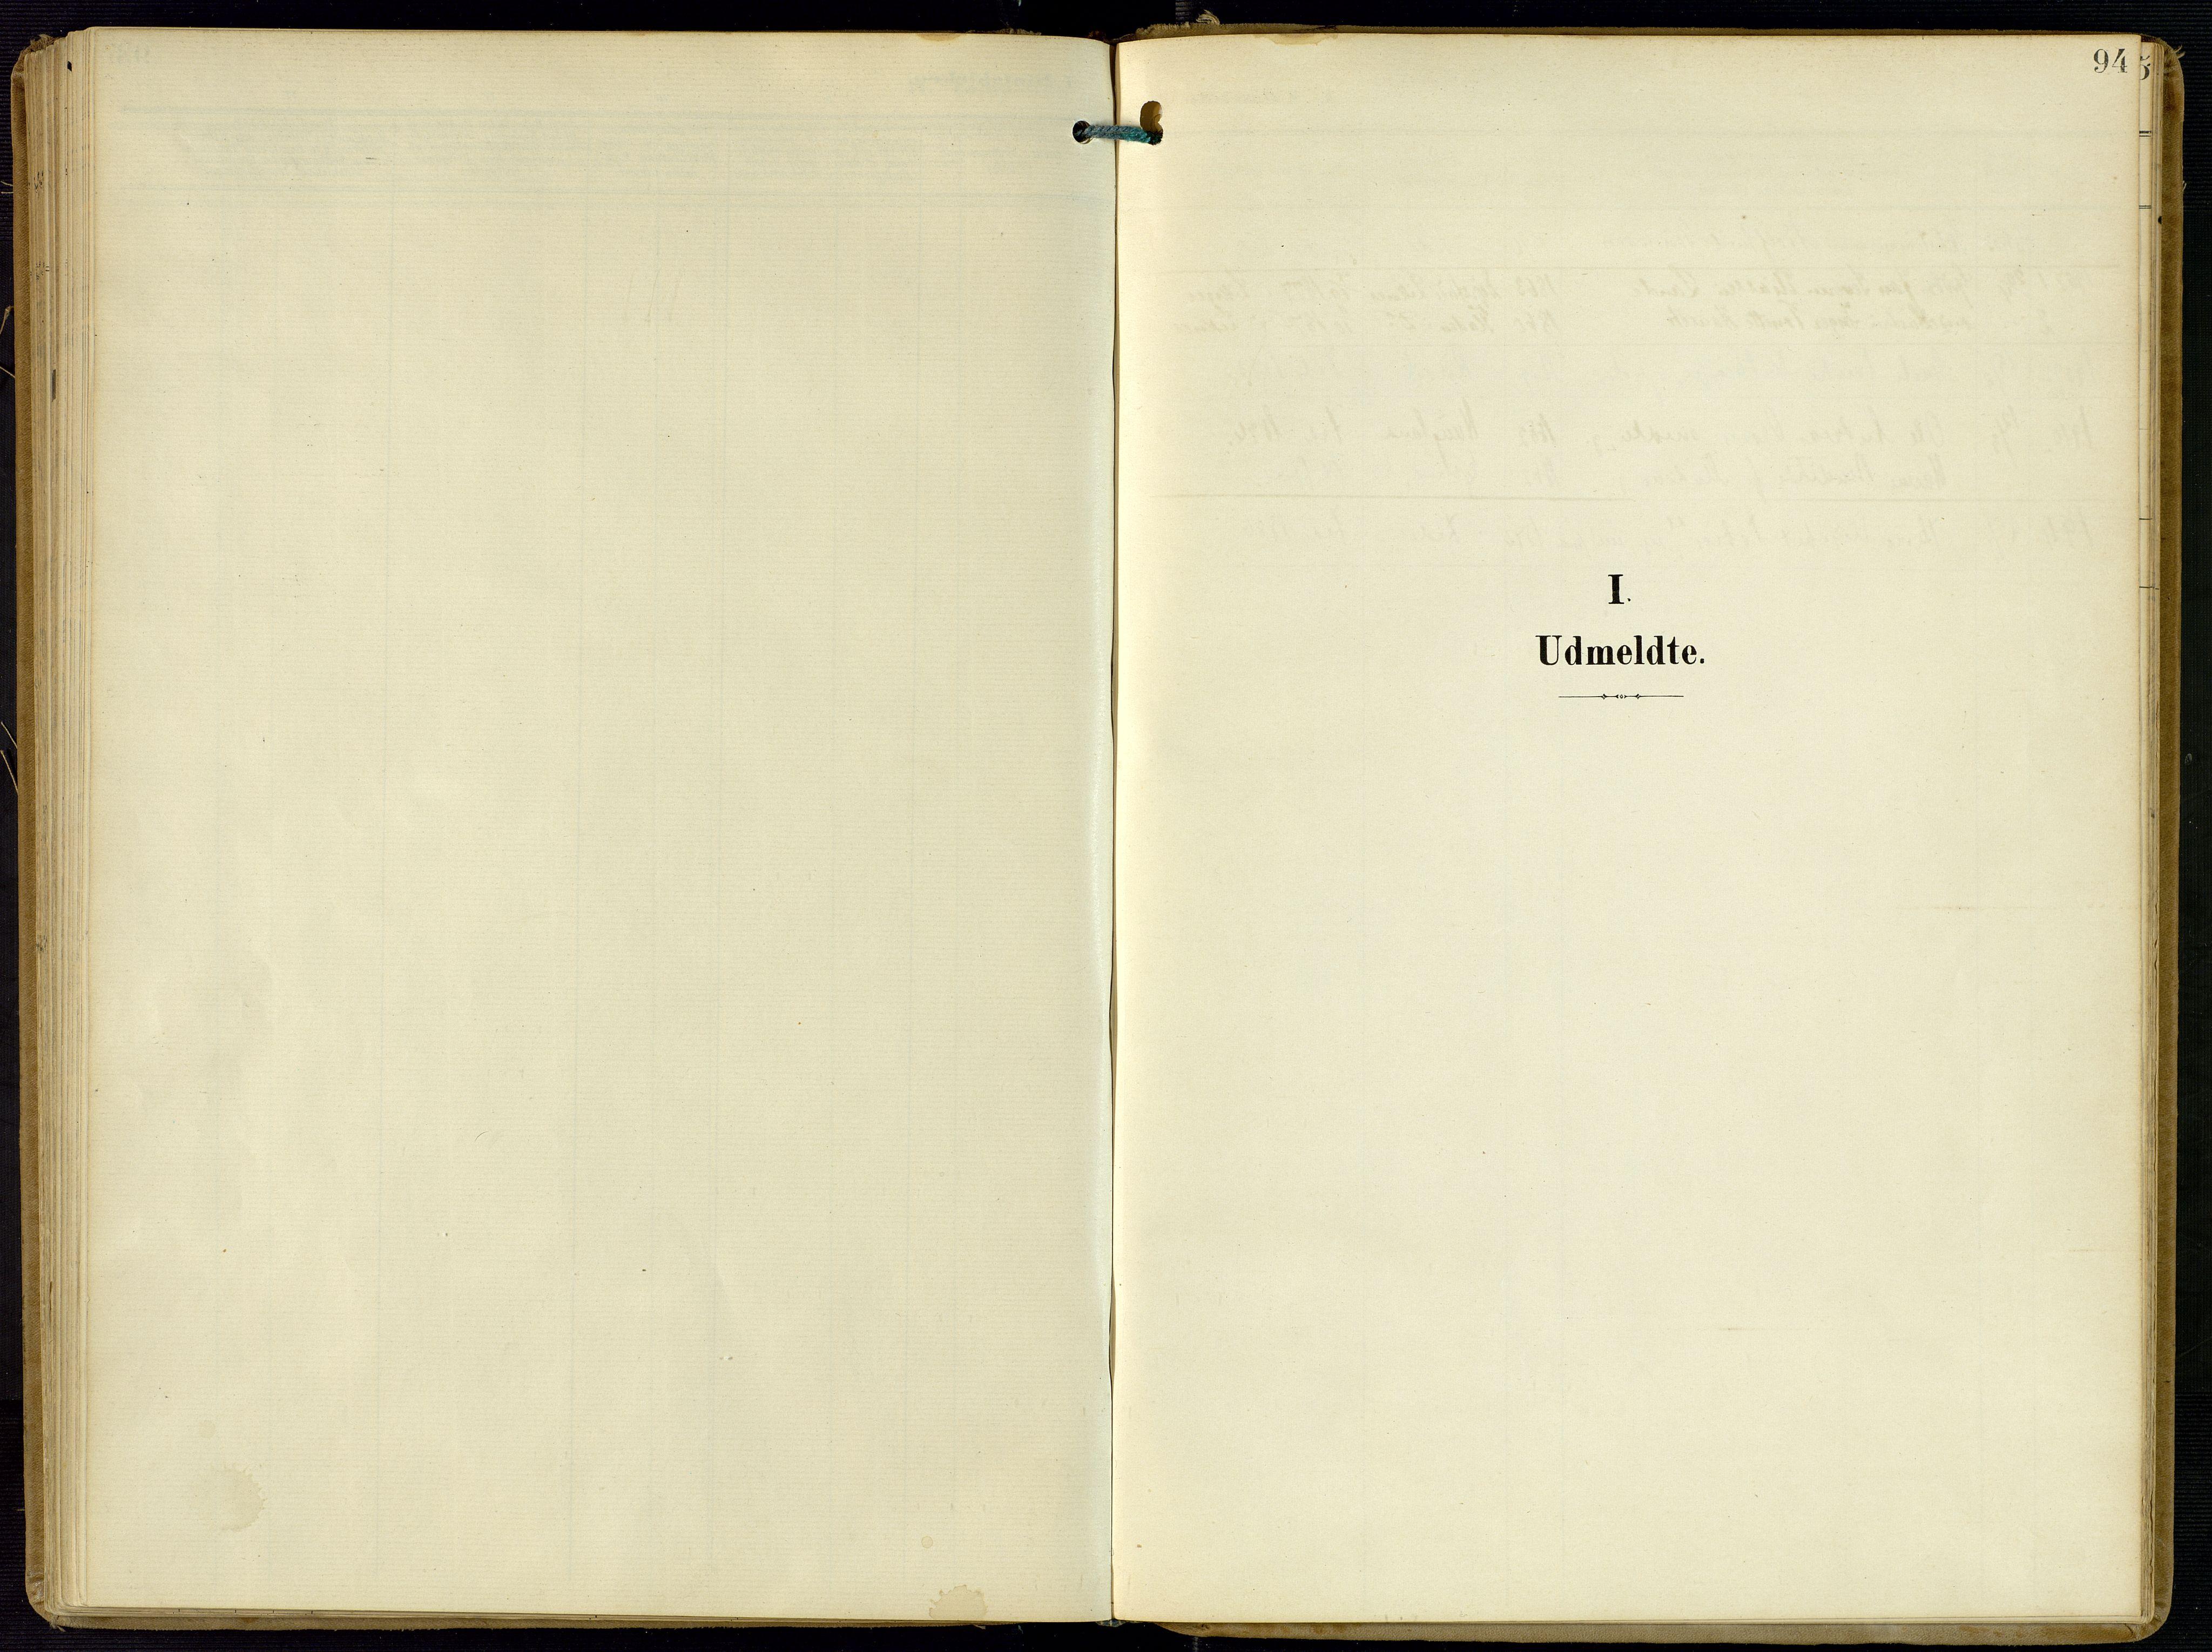 SAK, Kvinesdal sokneprestkontor, F/Fa/Faa/L0005: Ministerialbok nr. A 5, 1898-1915, s. 93